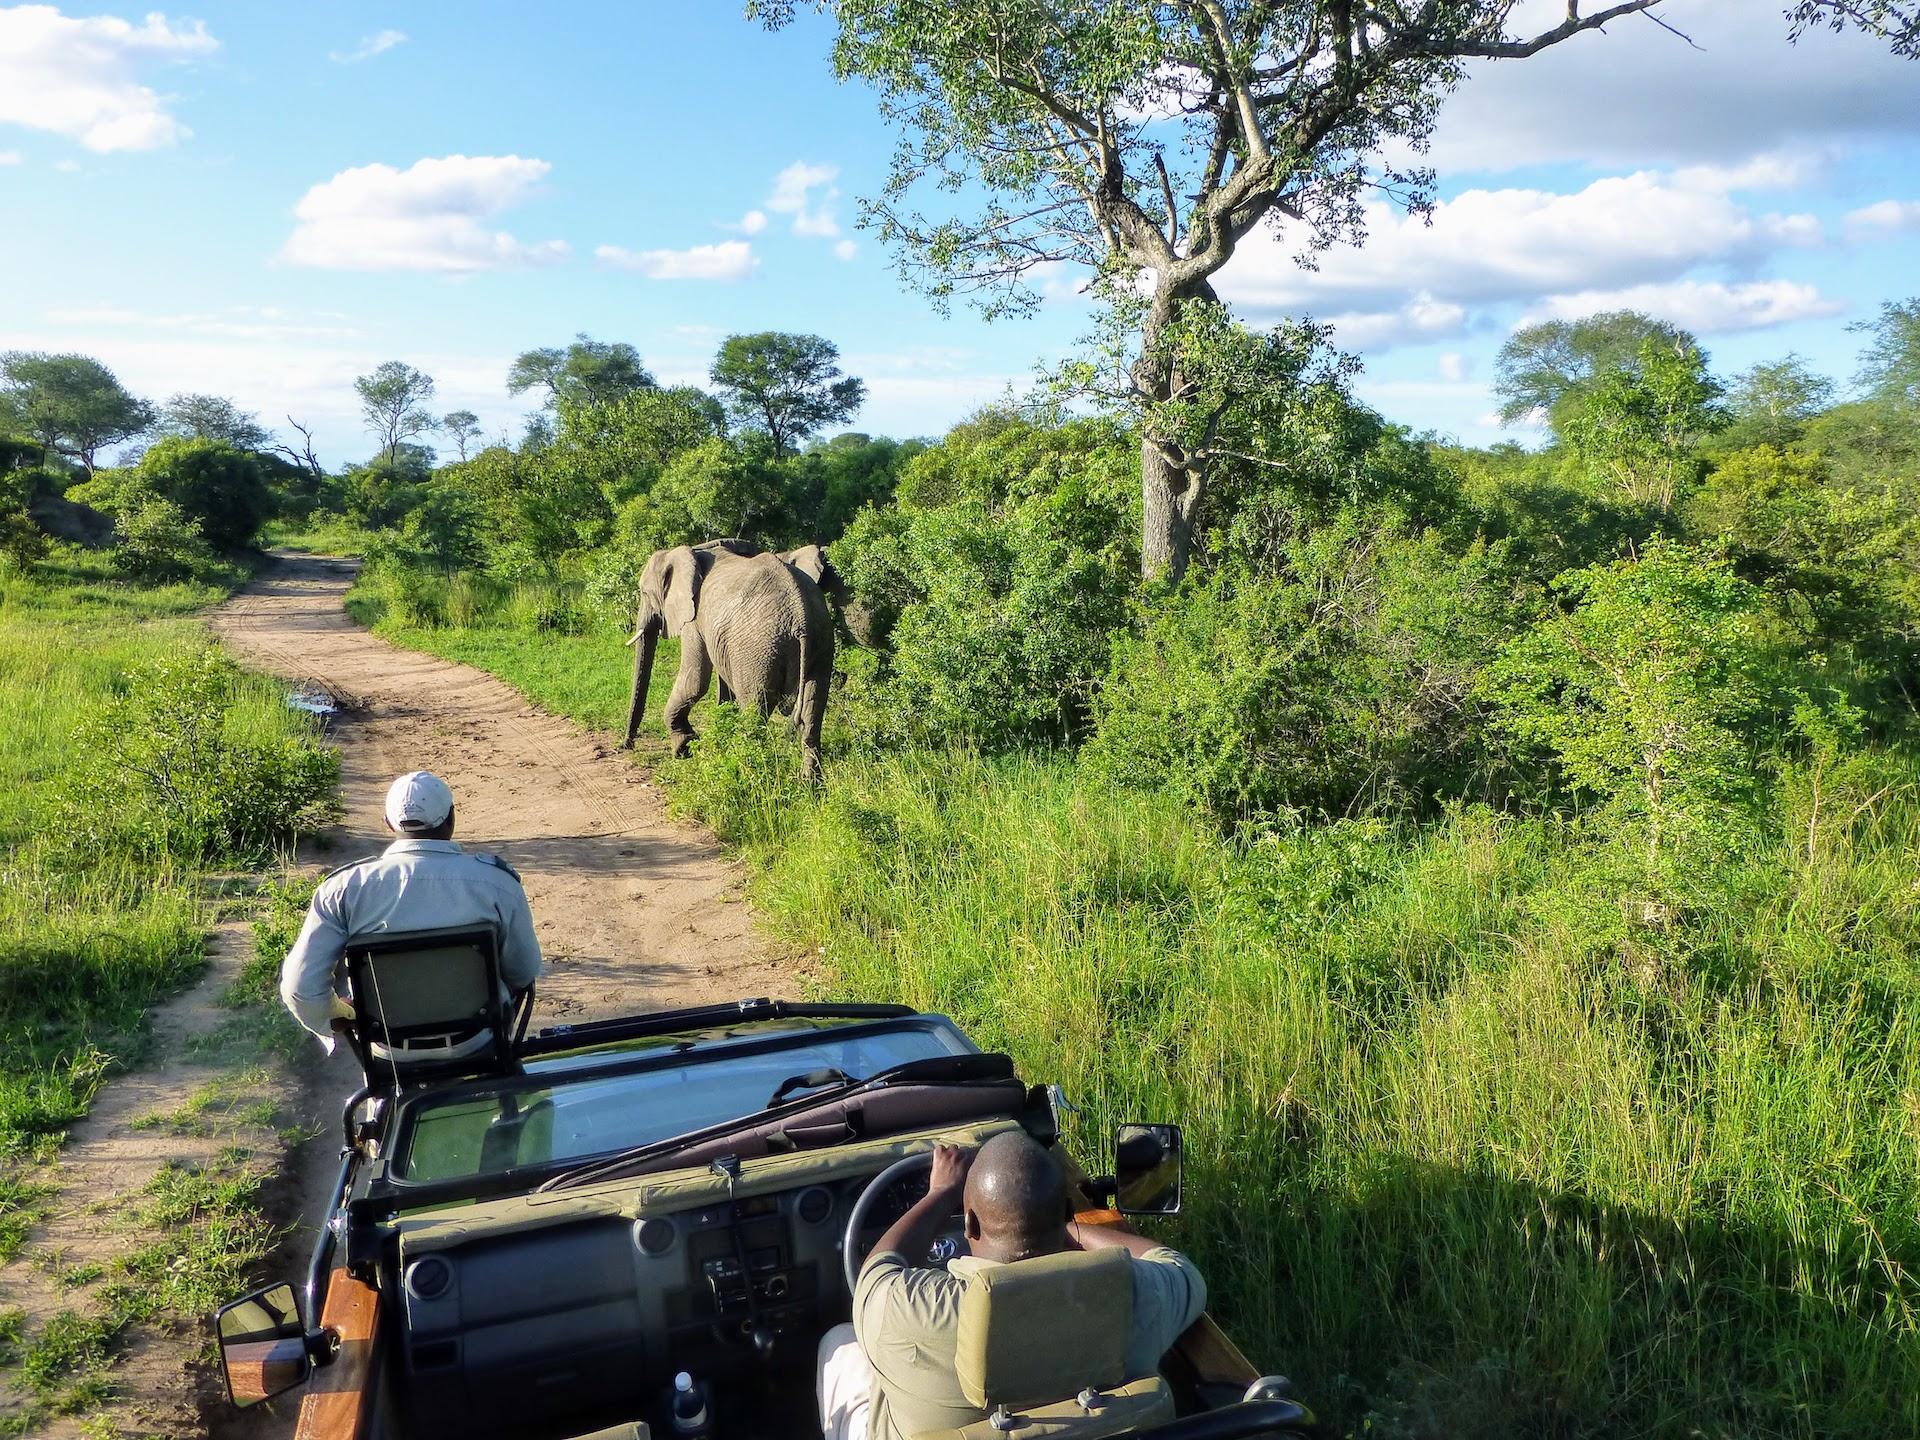 South Africa safari - elephants